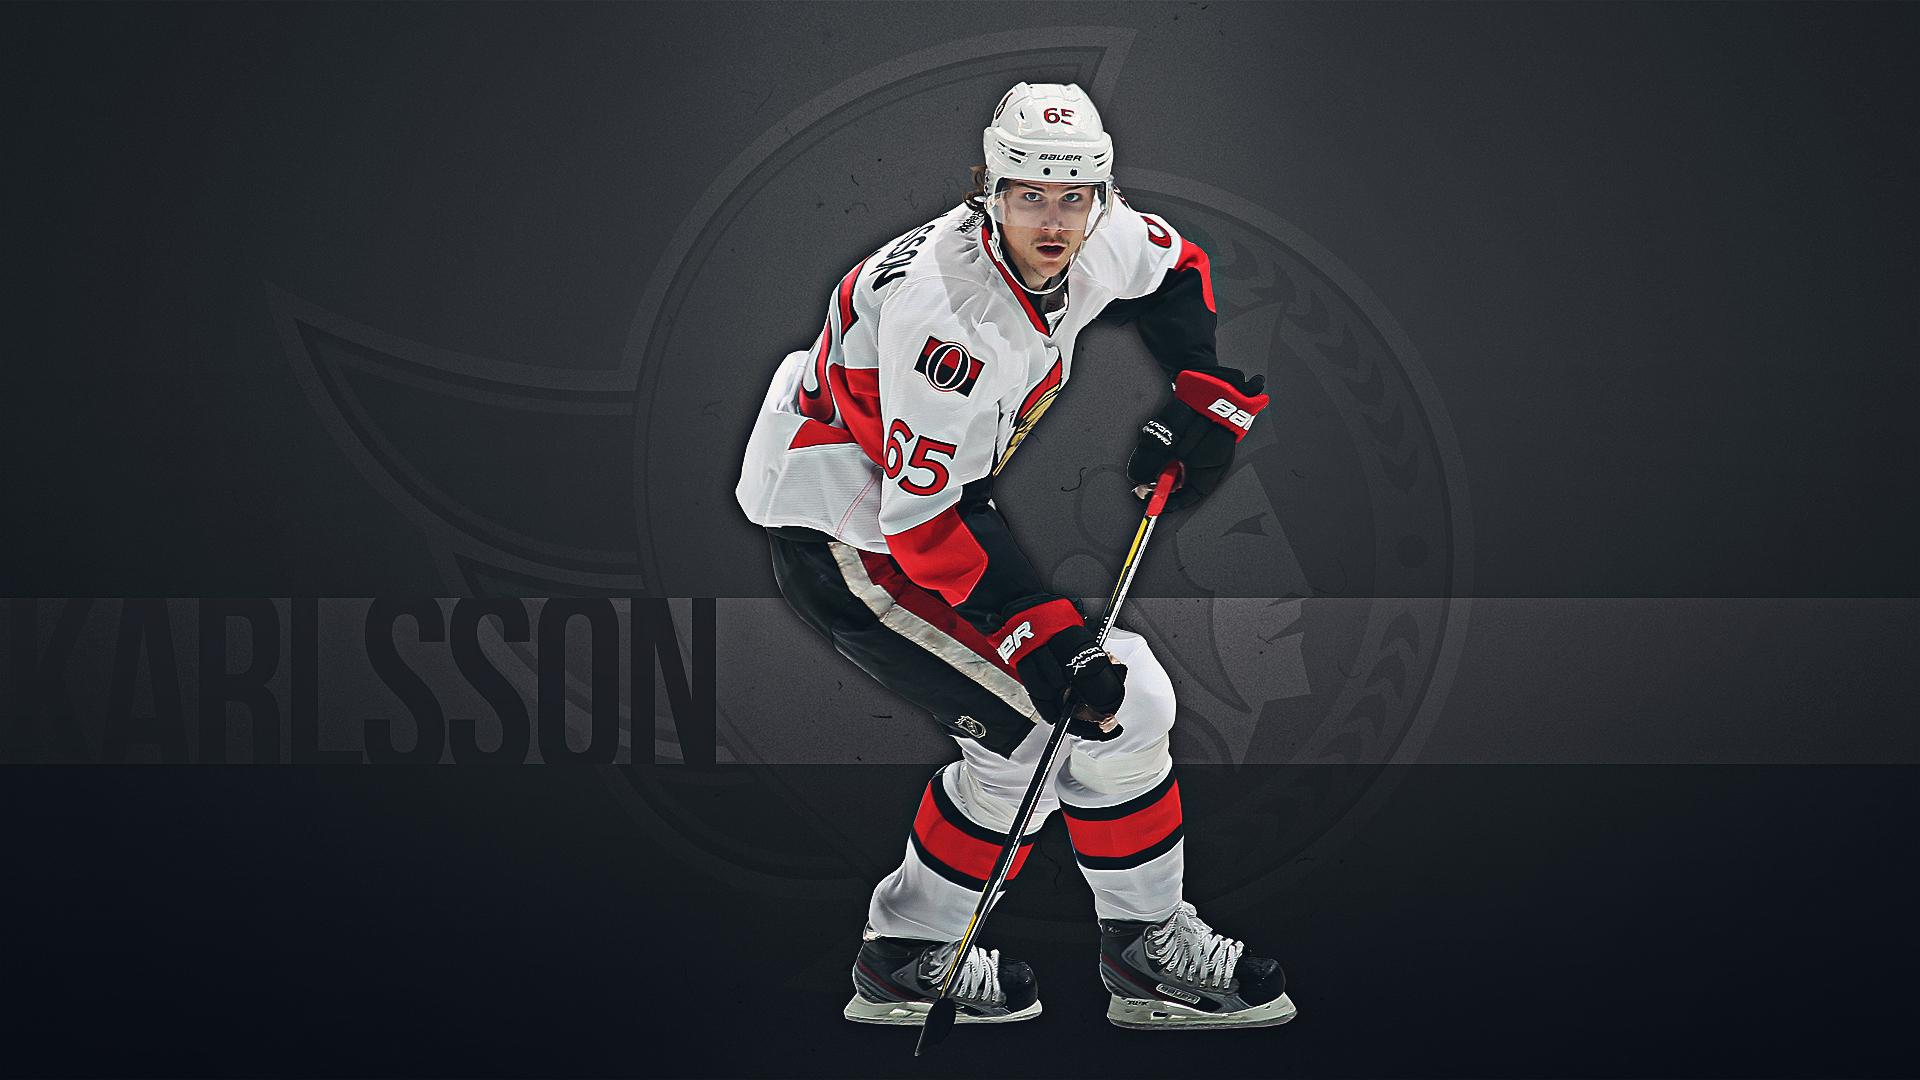 Best Hockey player Ottawa Erik Karlsson wallpapers and images 1920x1080